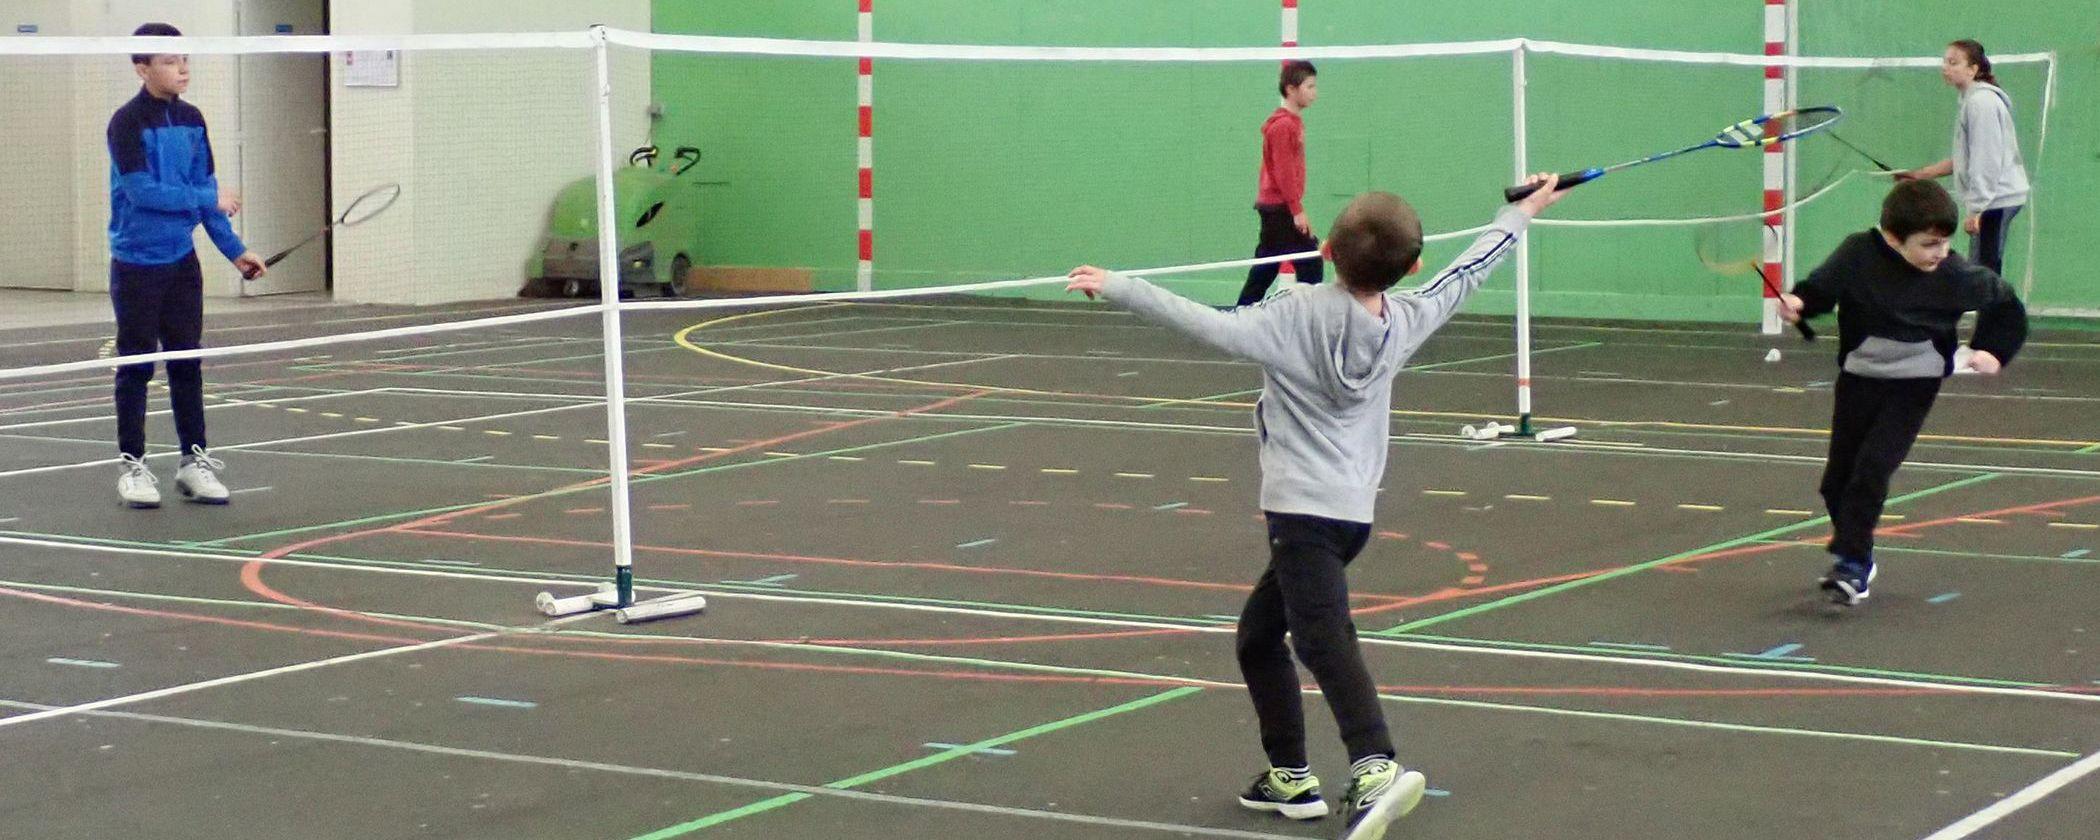 Vacansports Badminton OSEN Saint-Malo